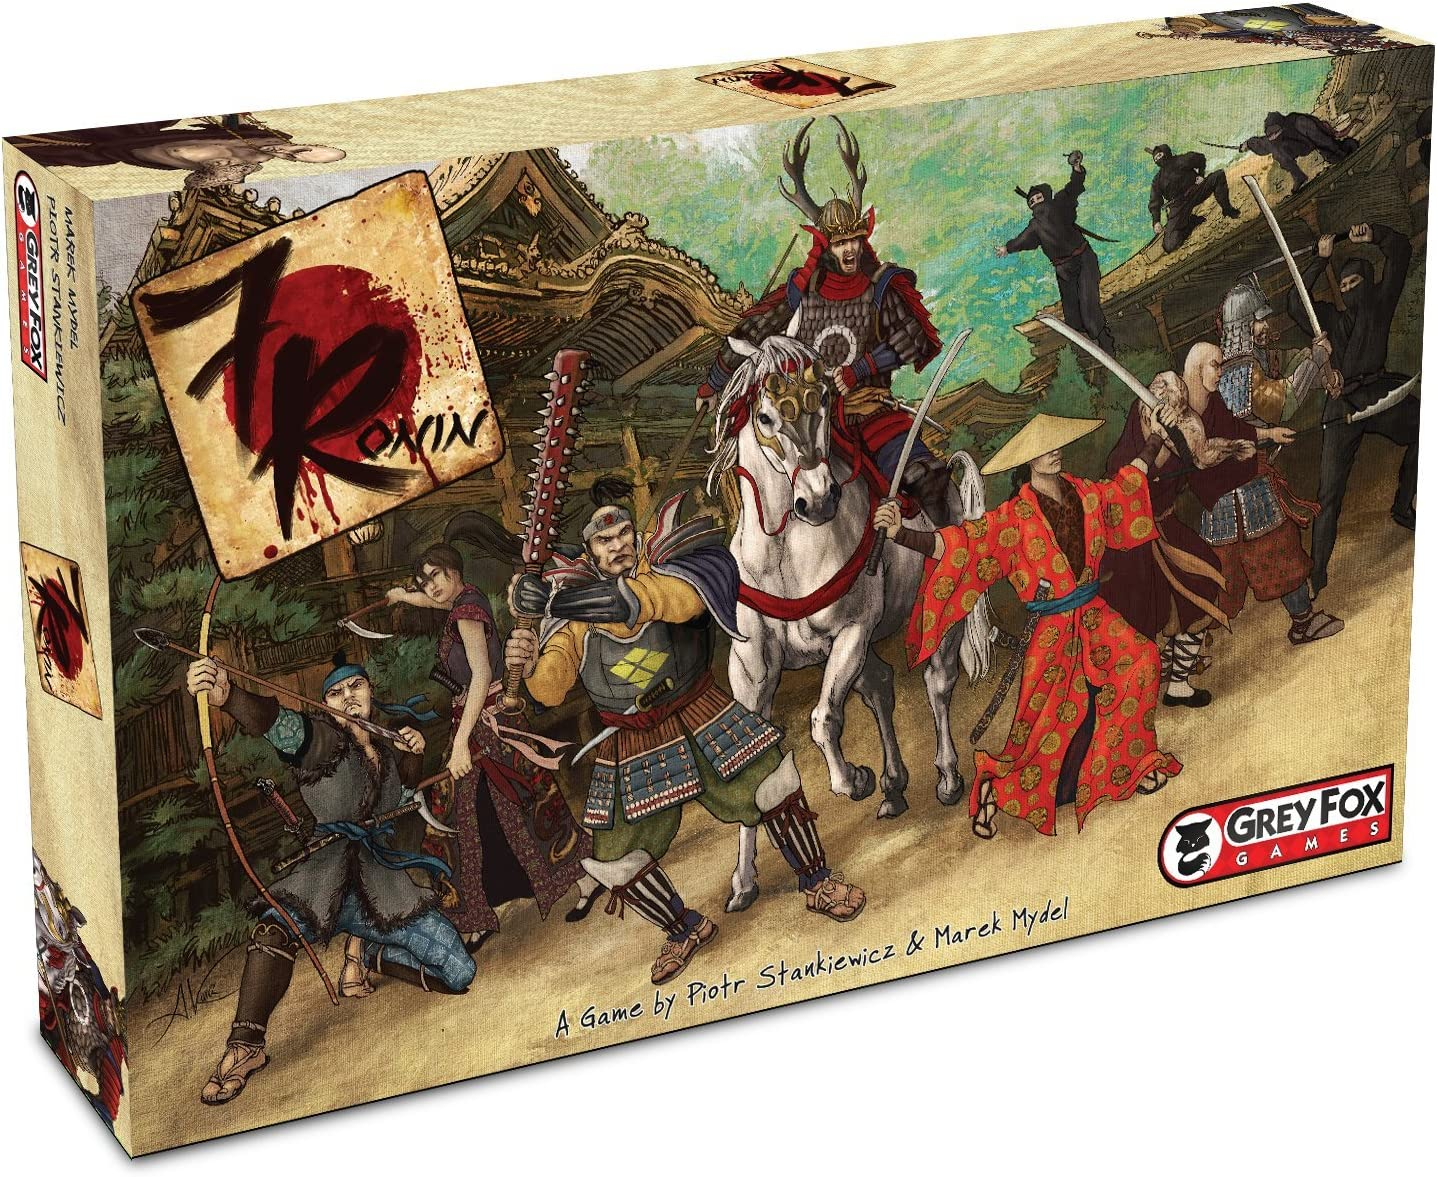 7 Ronin Board Game by Grey Fox Games